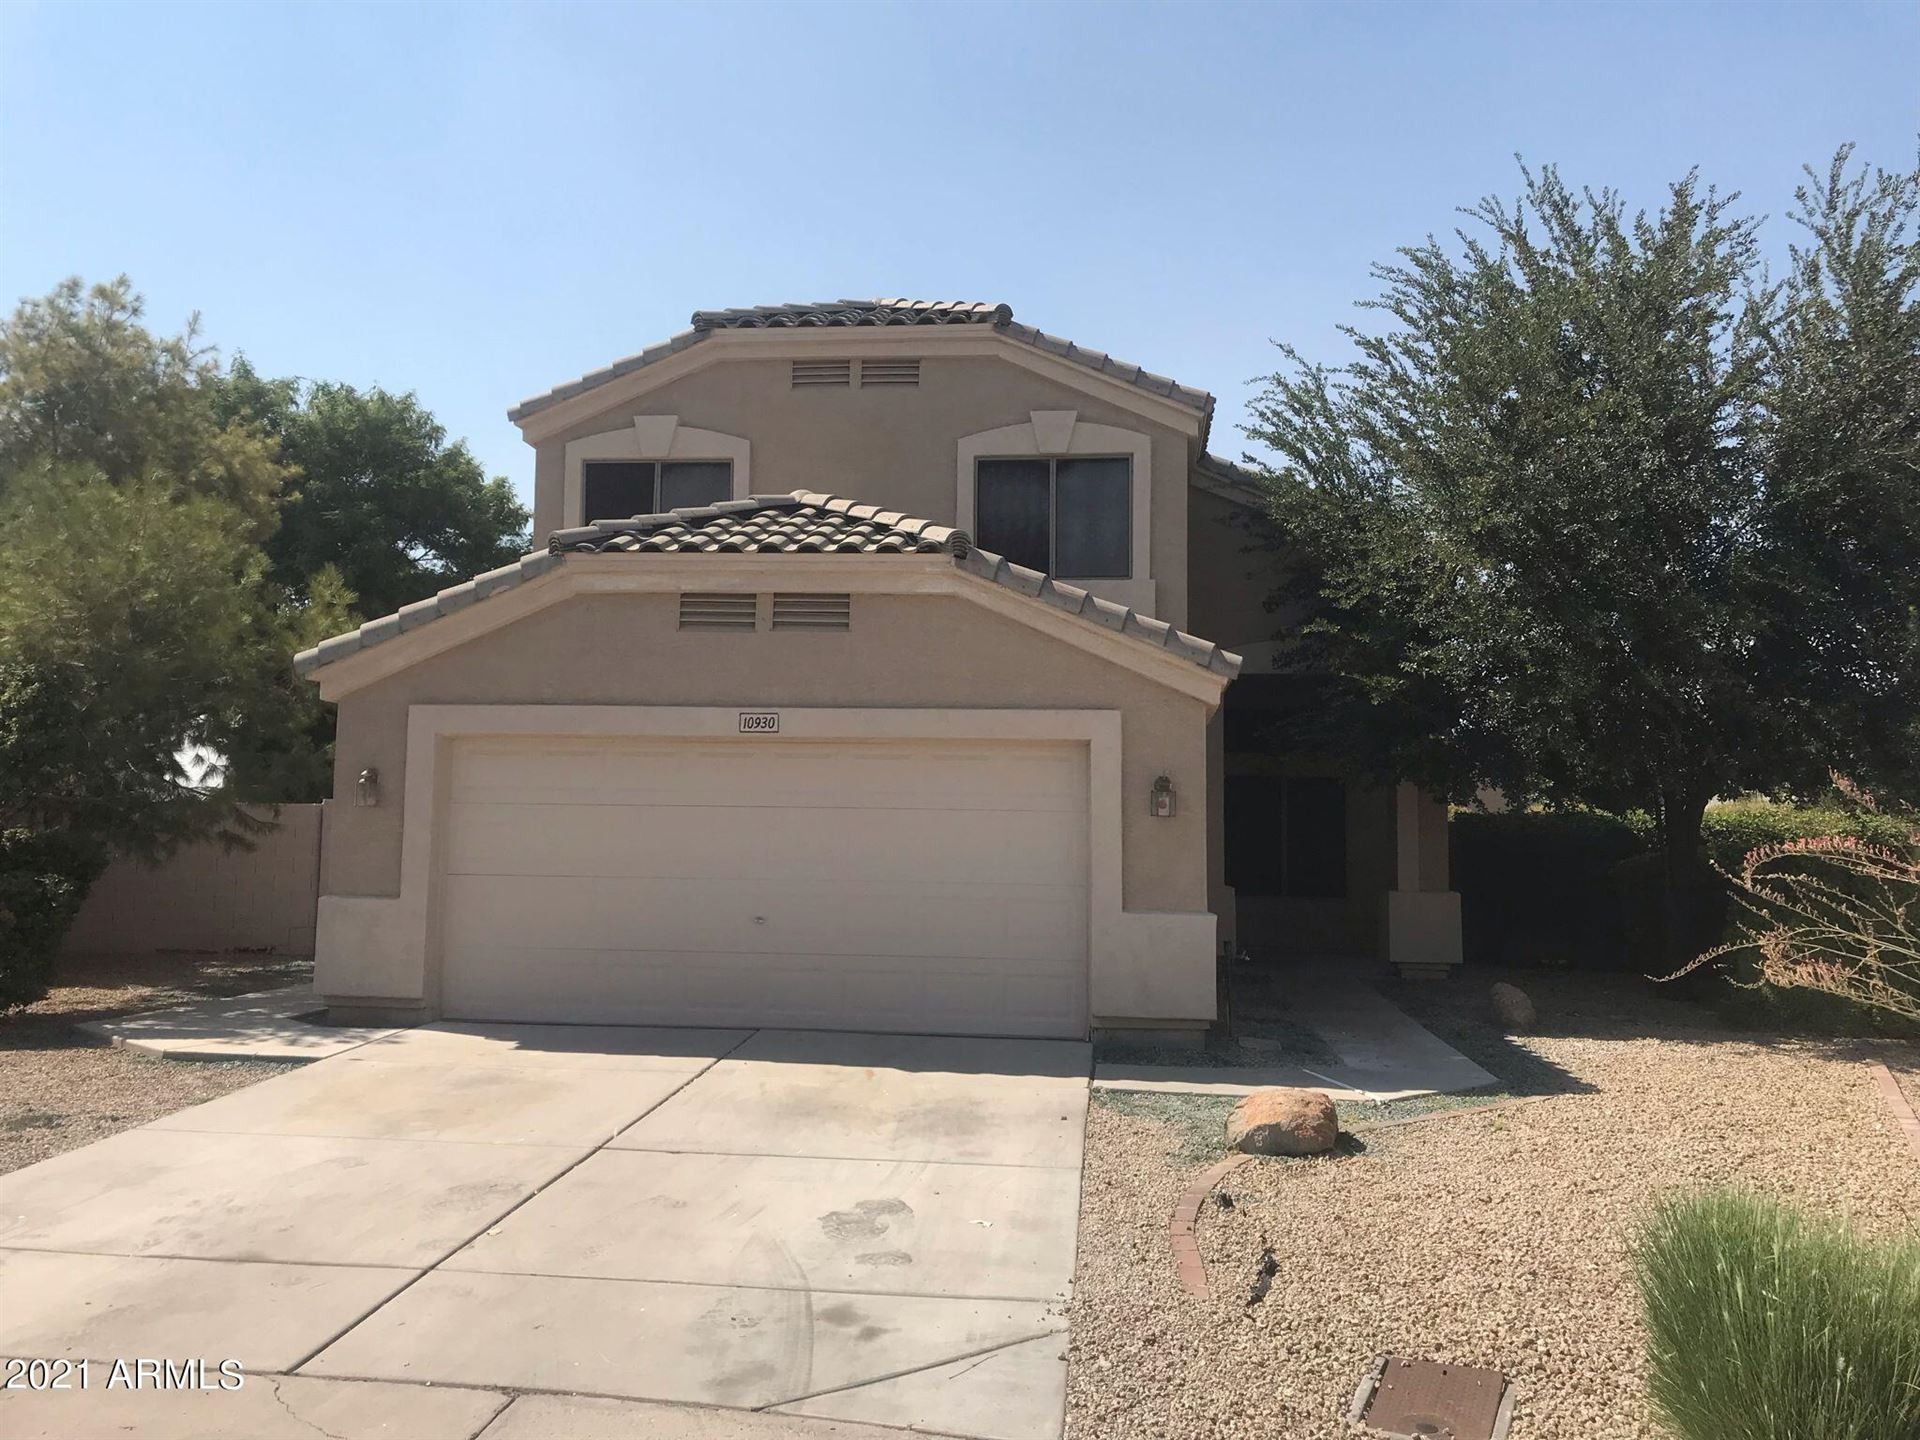 Photo of 10930 W CAMBRIDGE Avenue, Avondale, AZ 85392 (MLS # 6294428)